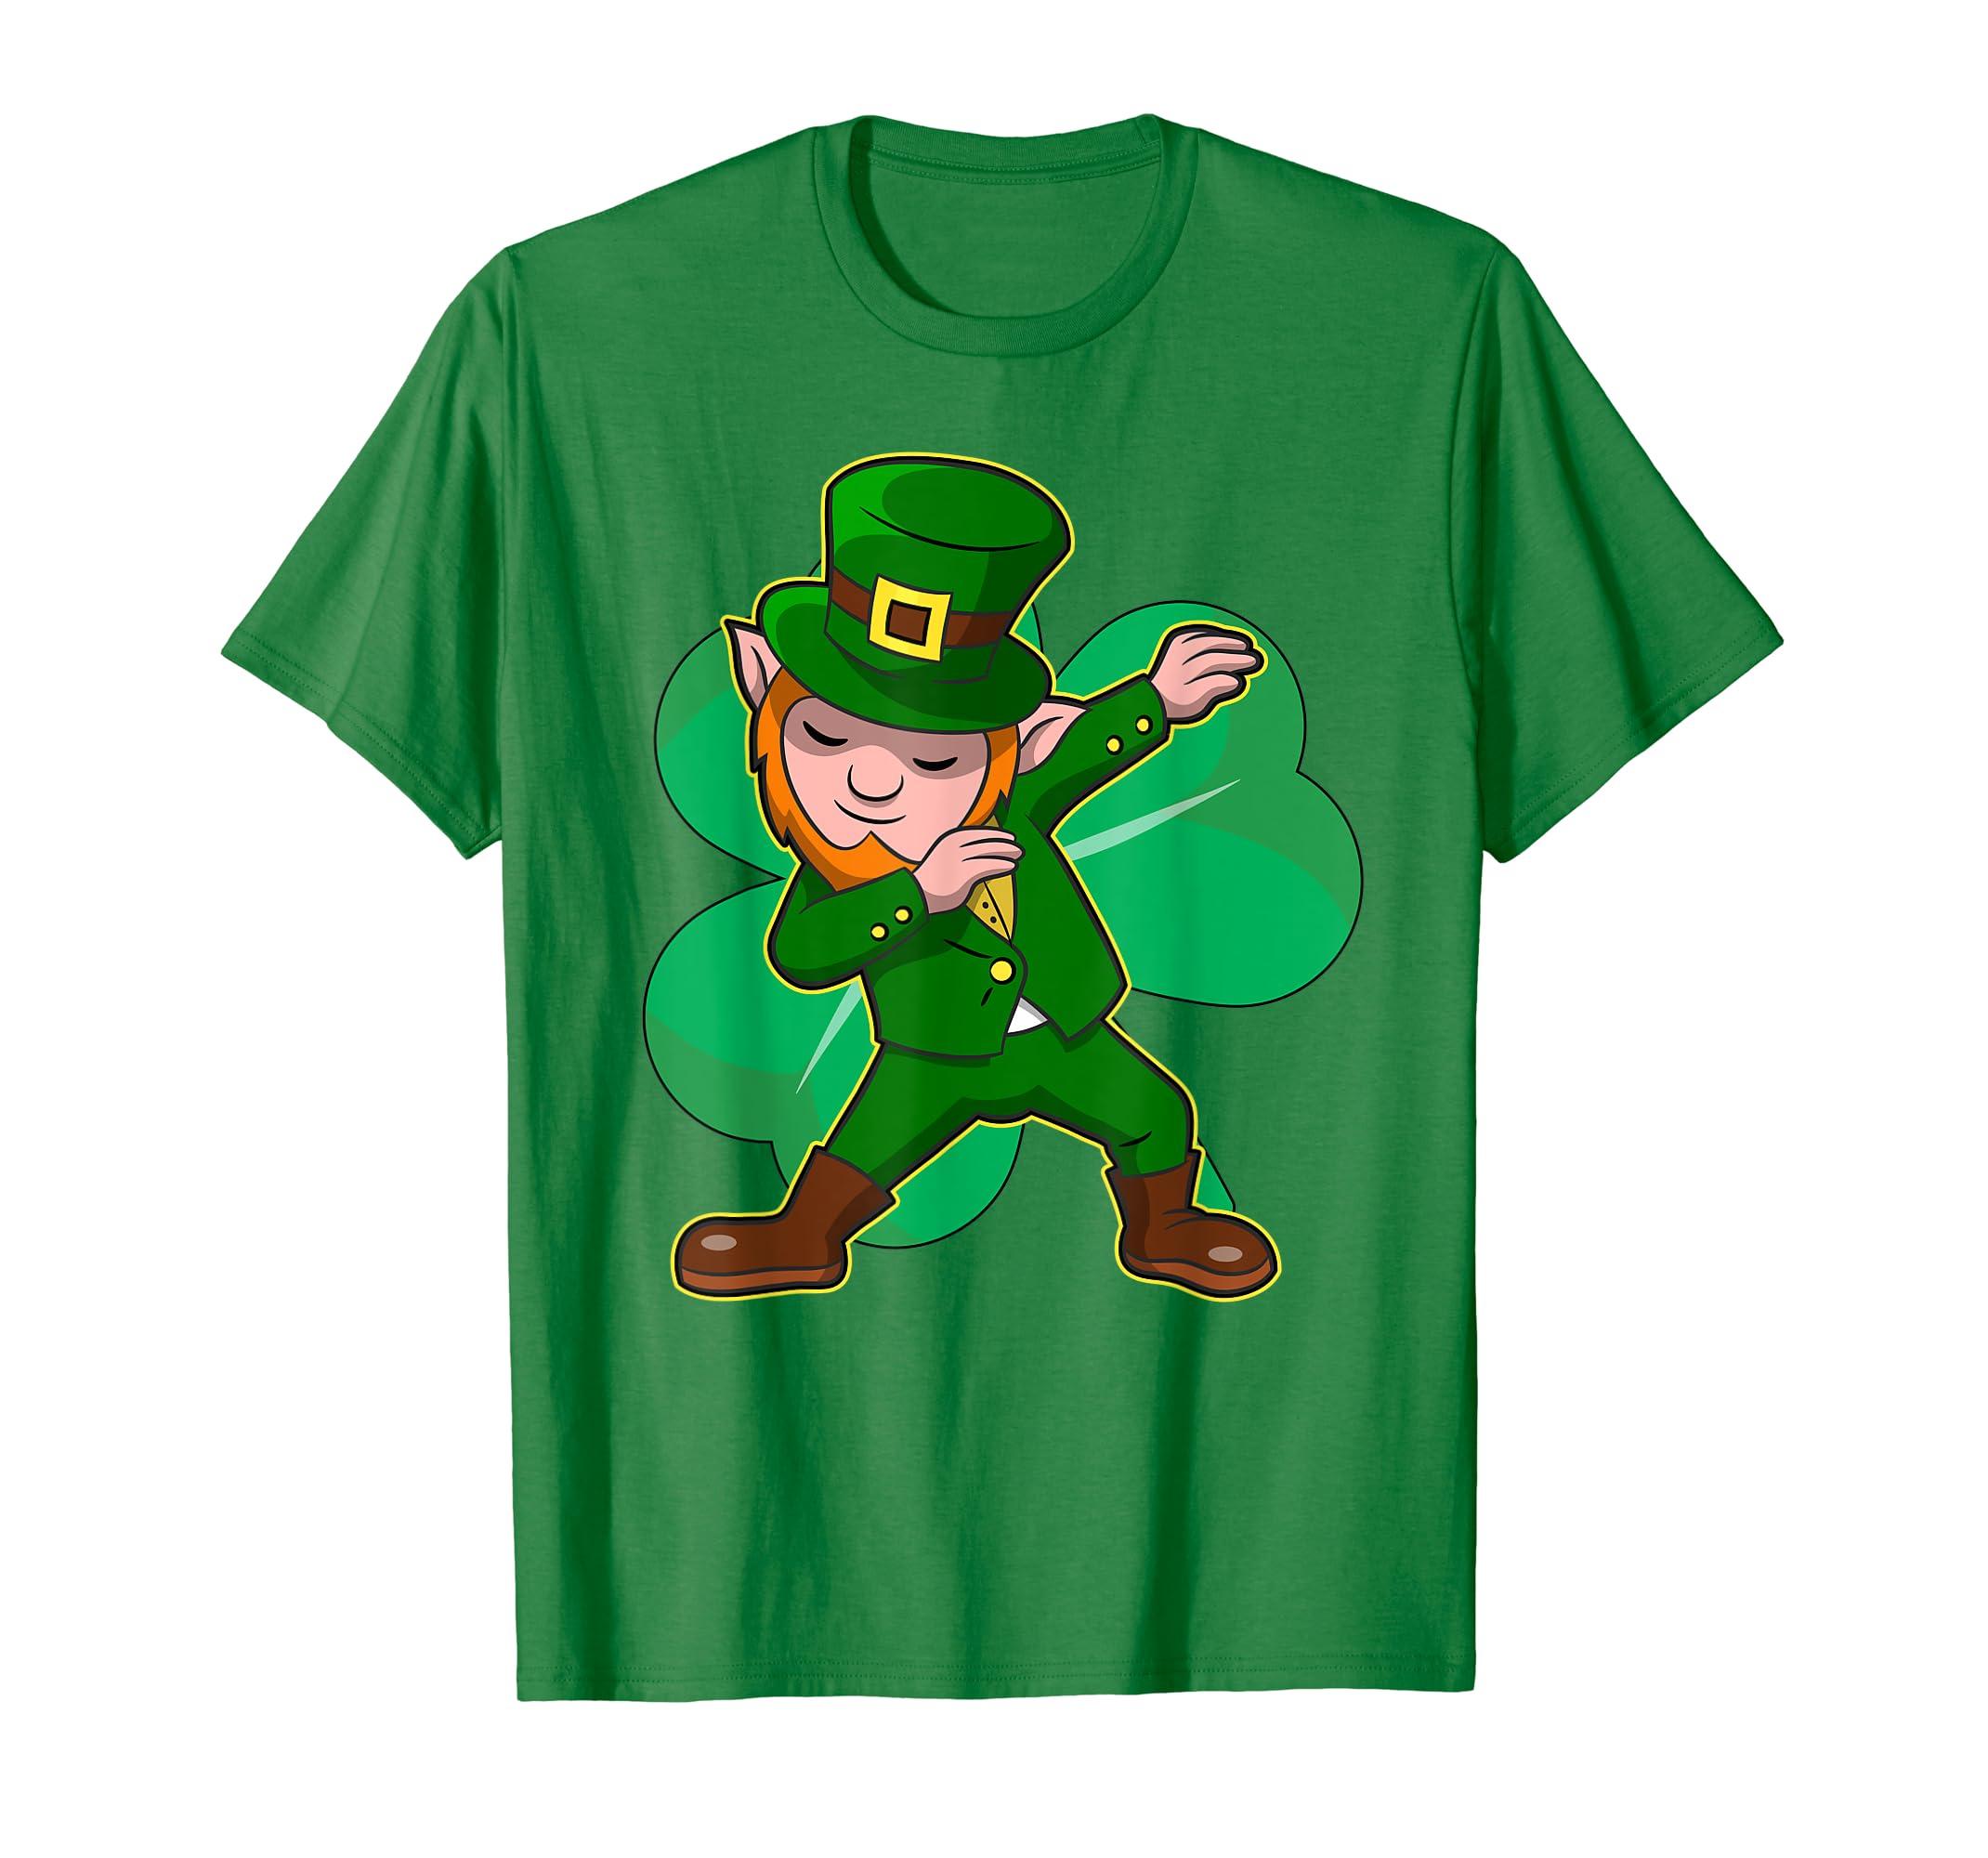 297dc5074 Amazon.com: Dabbing Leprechaun Shirt Funny Dab St Patrick Day Gift Idea:  Clothing